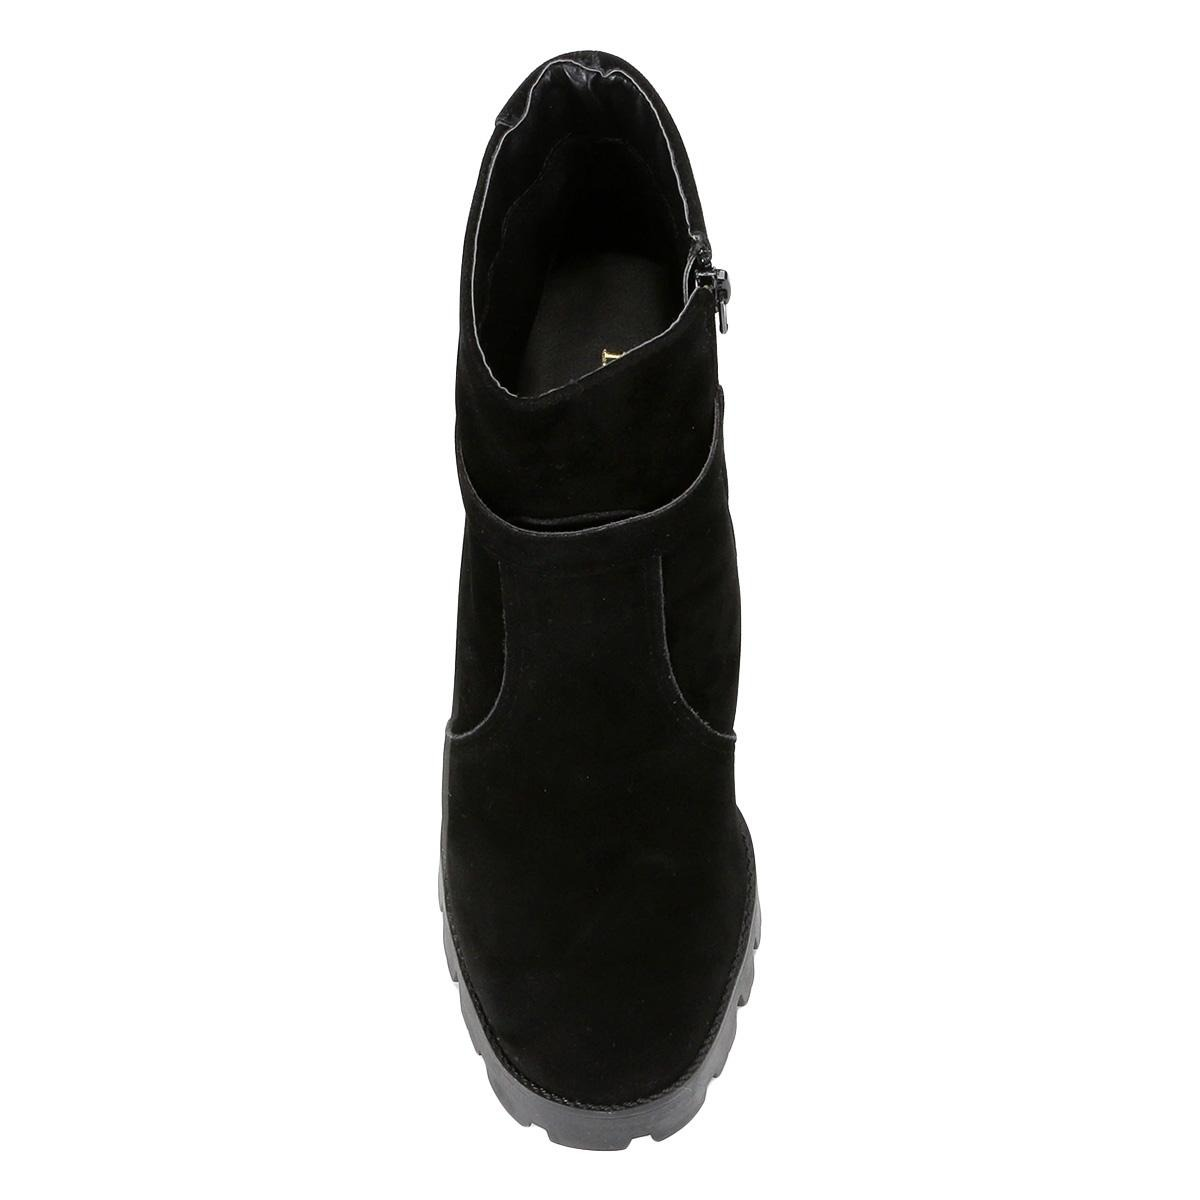 ce5590b0b61 bota cano curto drezzup tratorada fivela siena feminina. Carregando zoom.